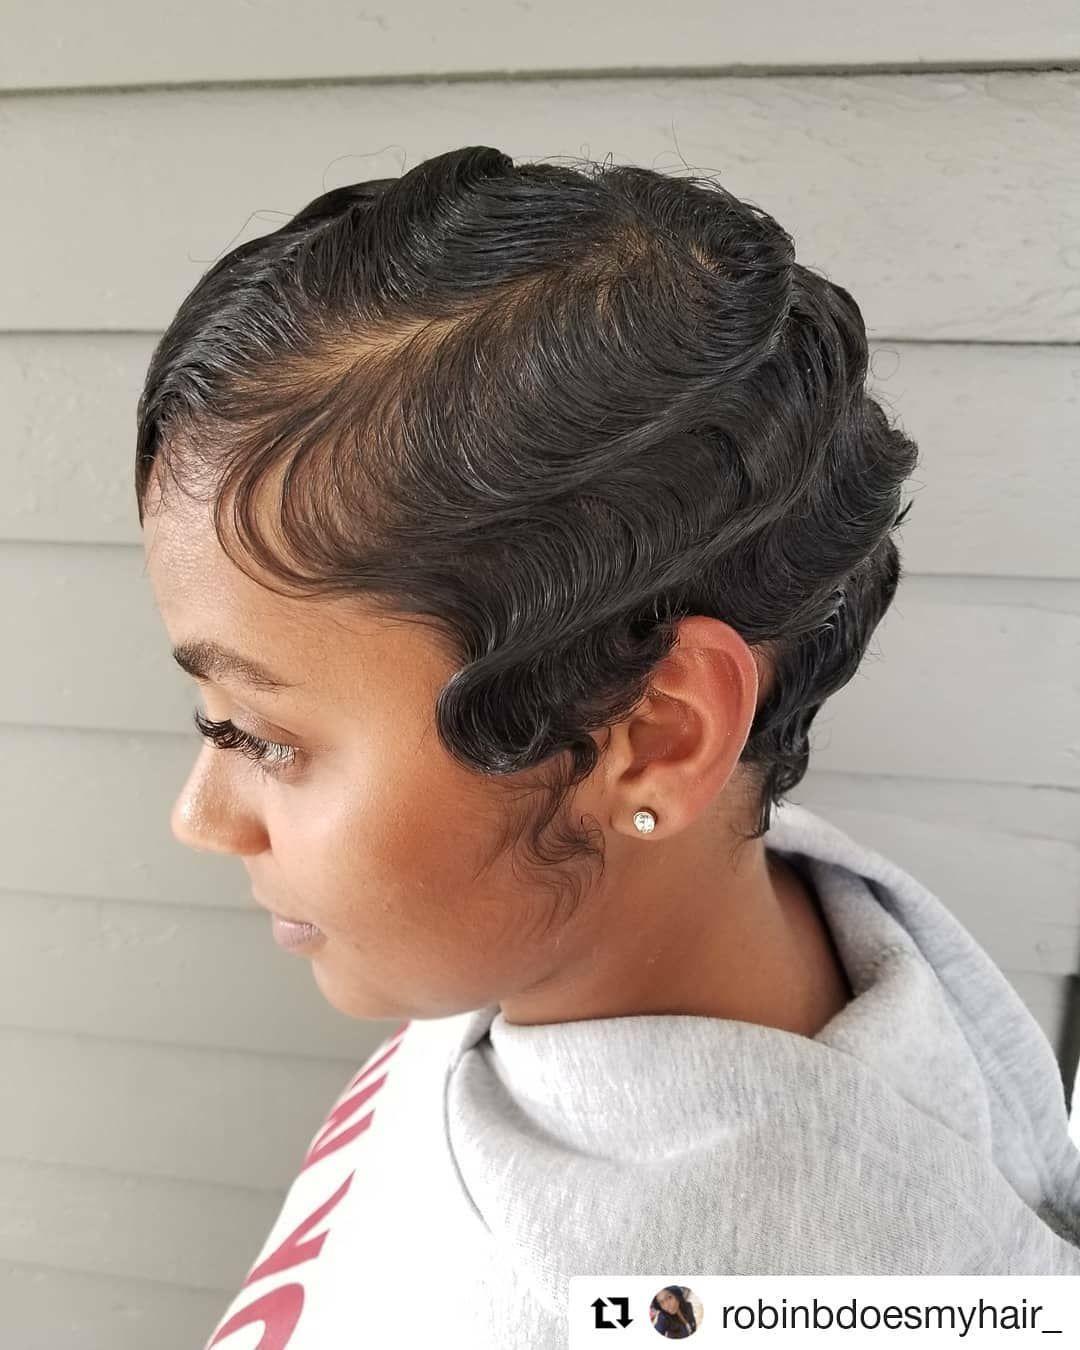 Style From Robinbdoesmyhair Of Like The River Salon In Atlanta Georgia Repost Robinbdoesmyhair Wavesssssss Natural Hair Styles Hair Styles Hair Salon